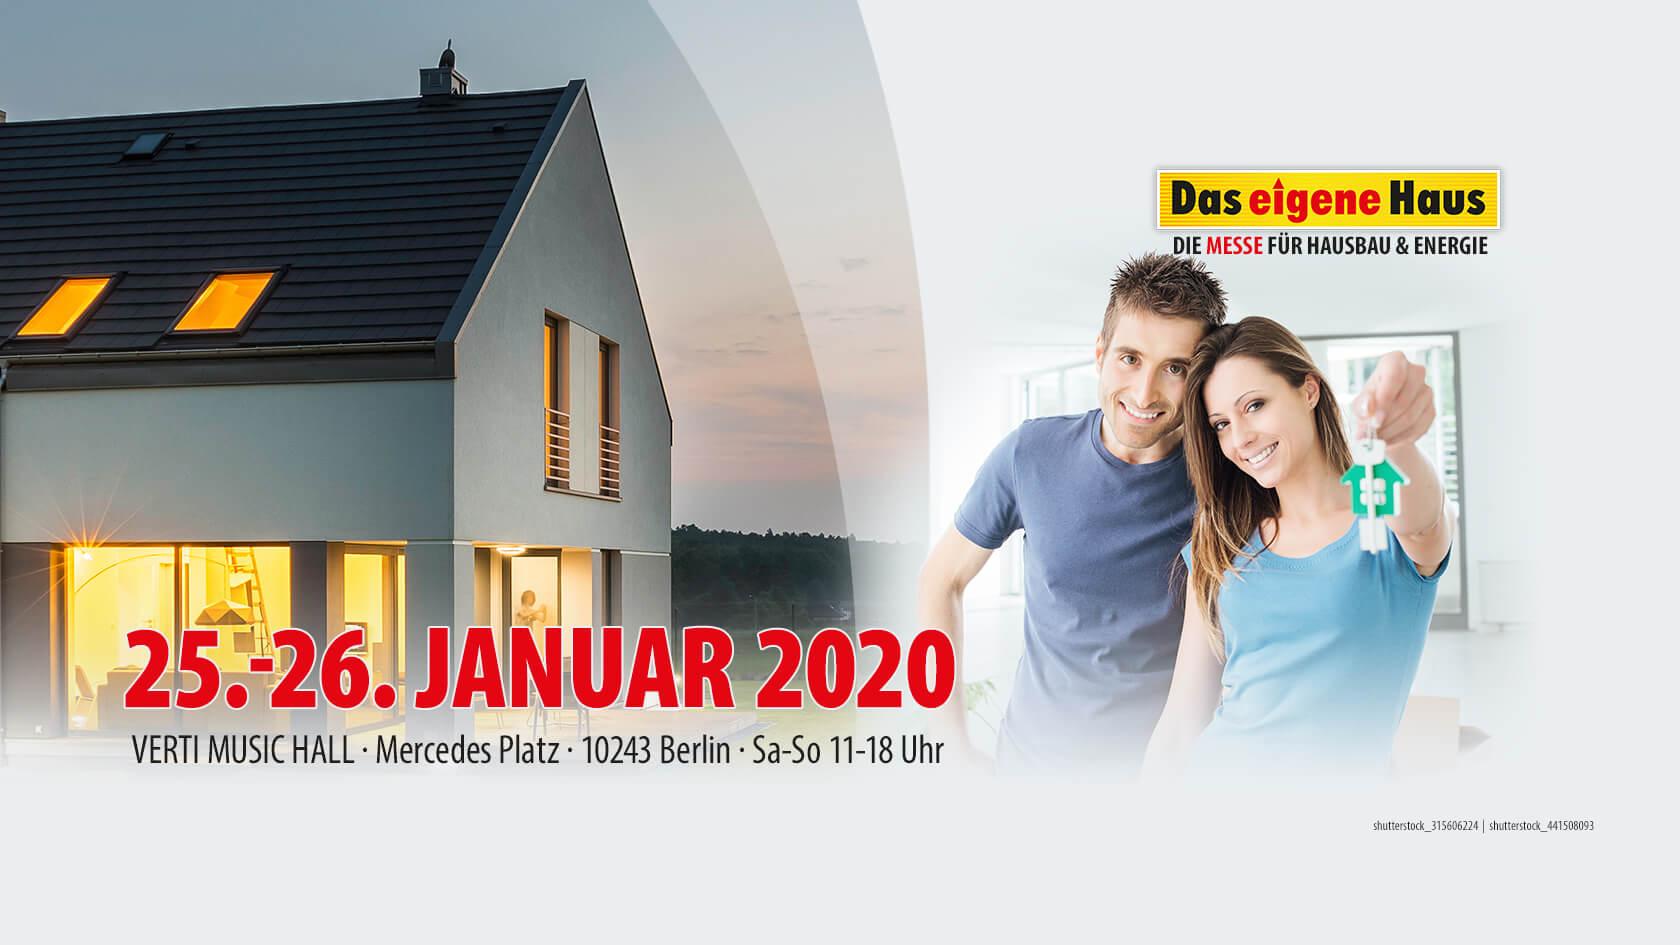 messe_das_eigene_haus_januar_2020